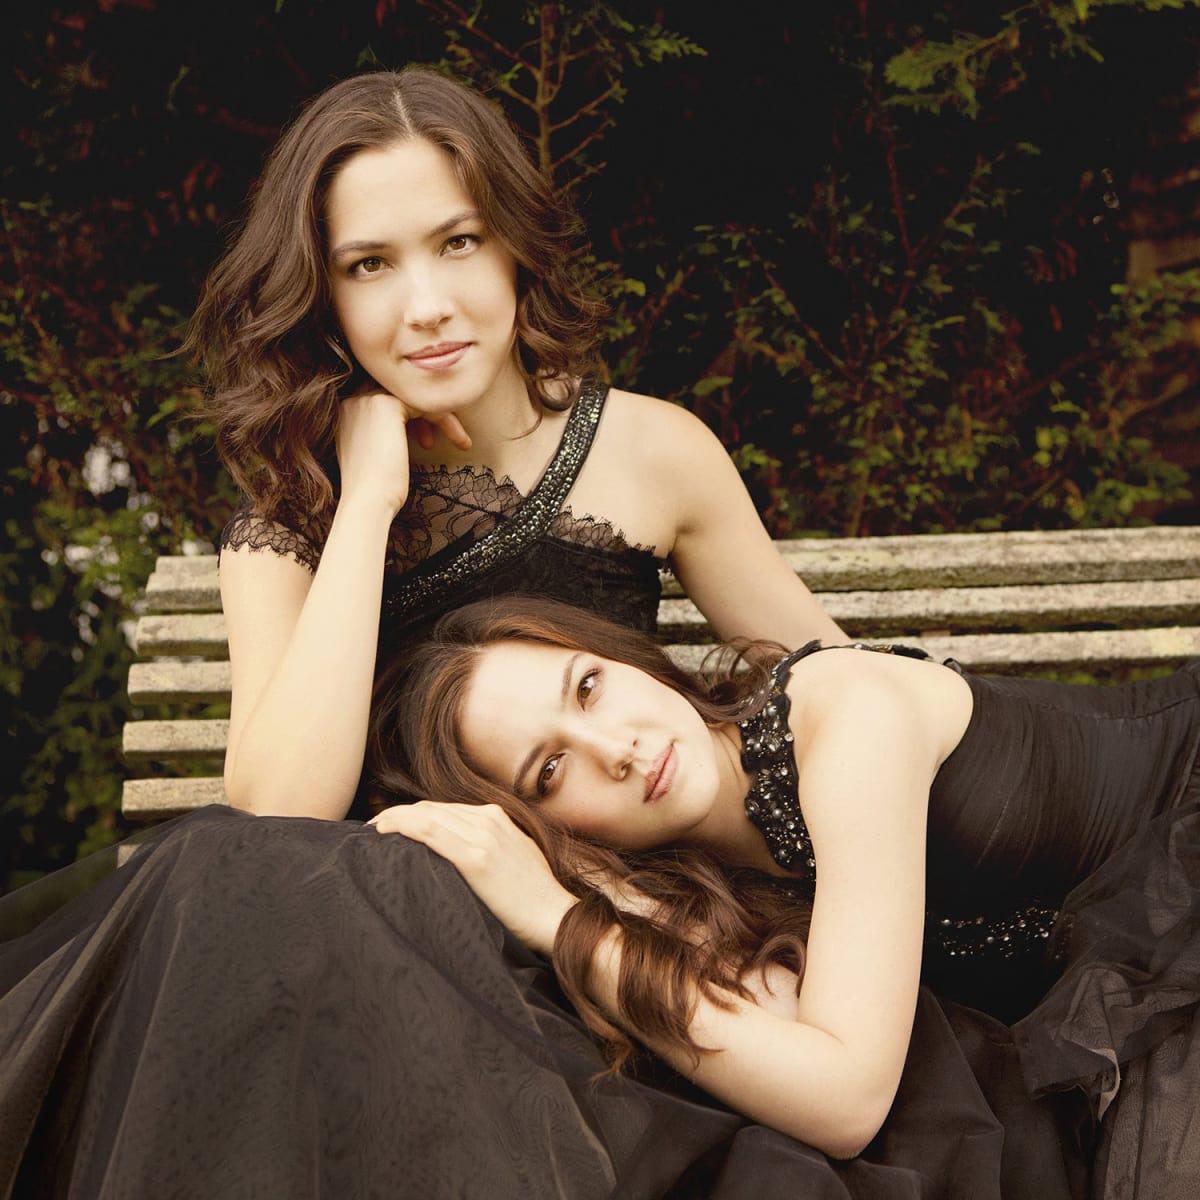 Christina and Michelle Naughton